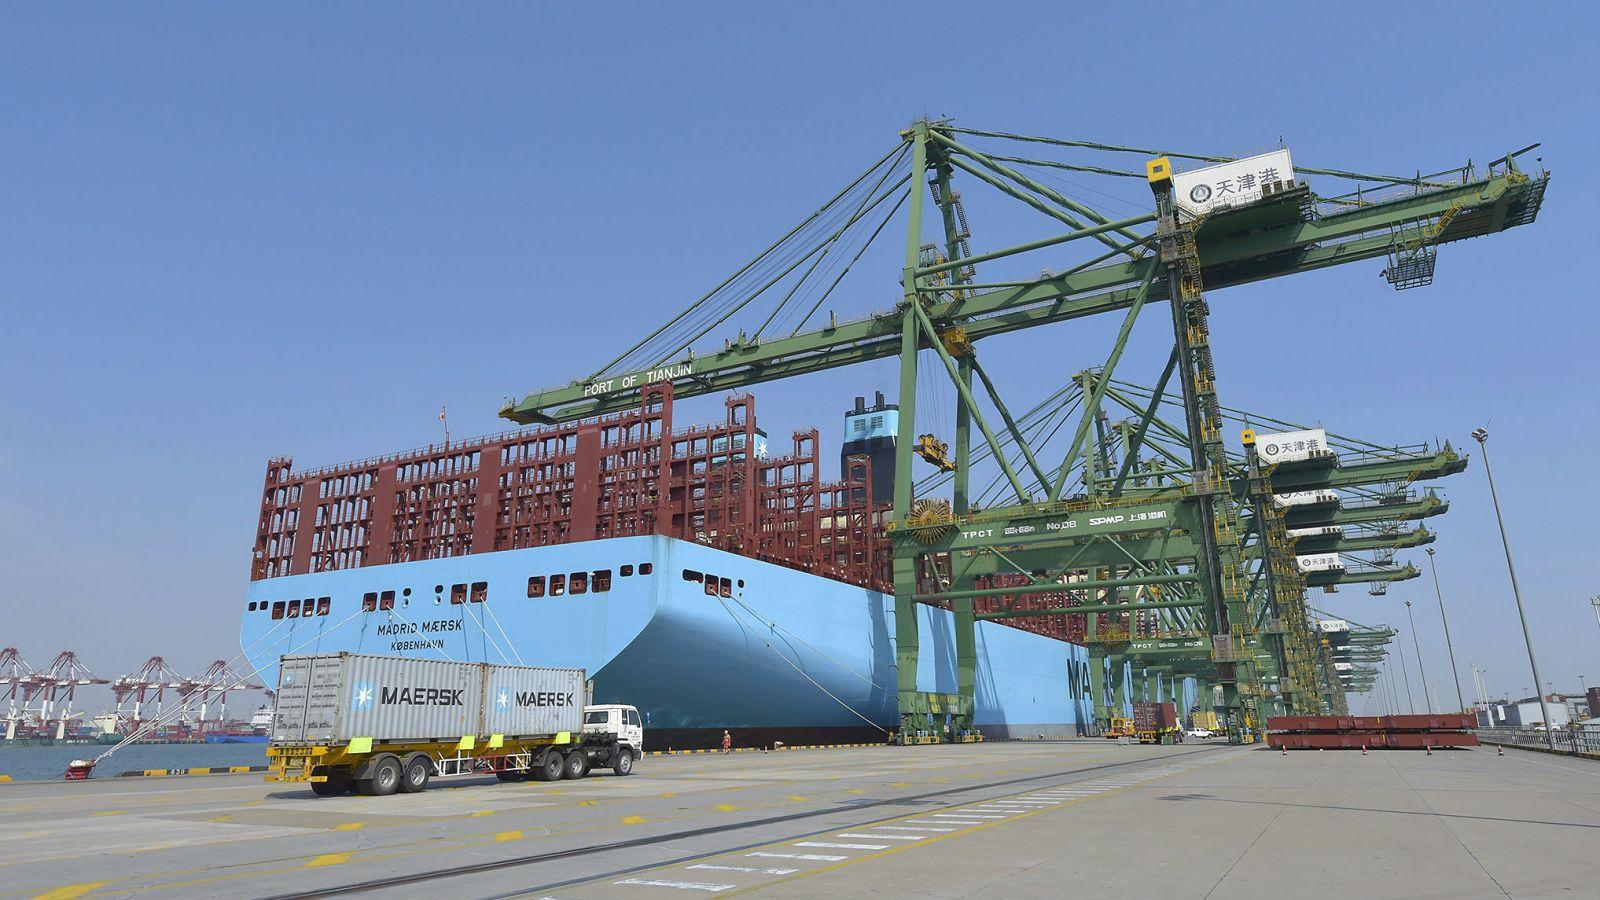 Madrid Maersk Makes Maiden Port Call